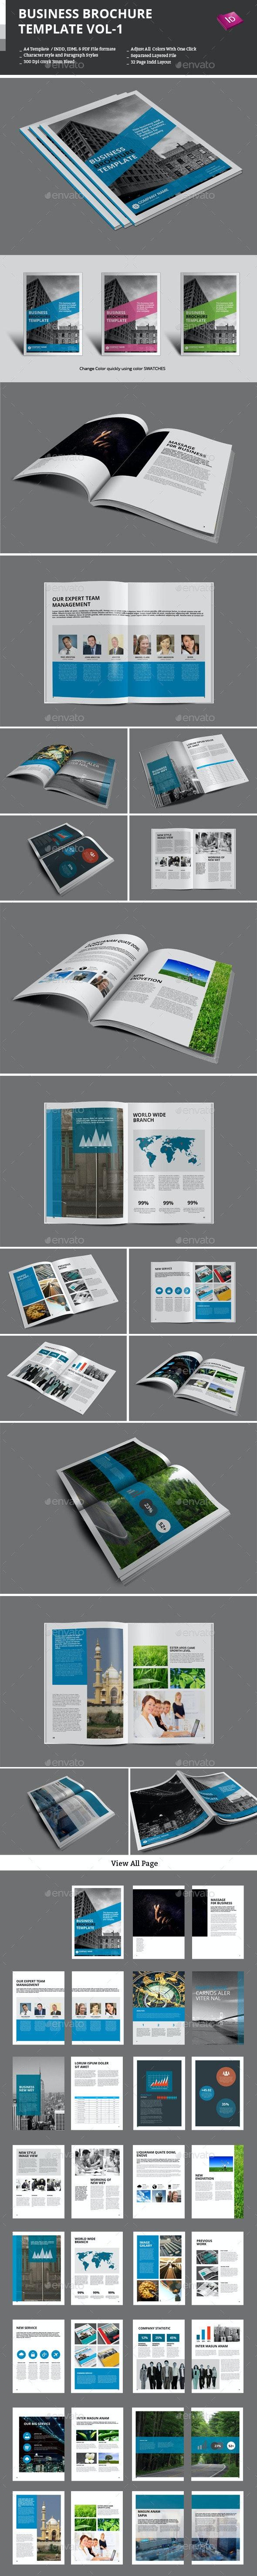 Business Brochure Templates Vol-1 - Corporate Brochures